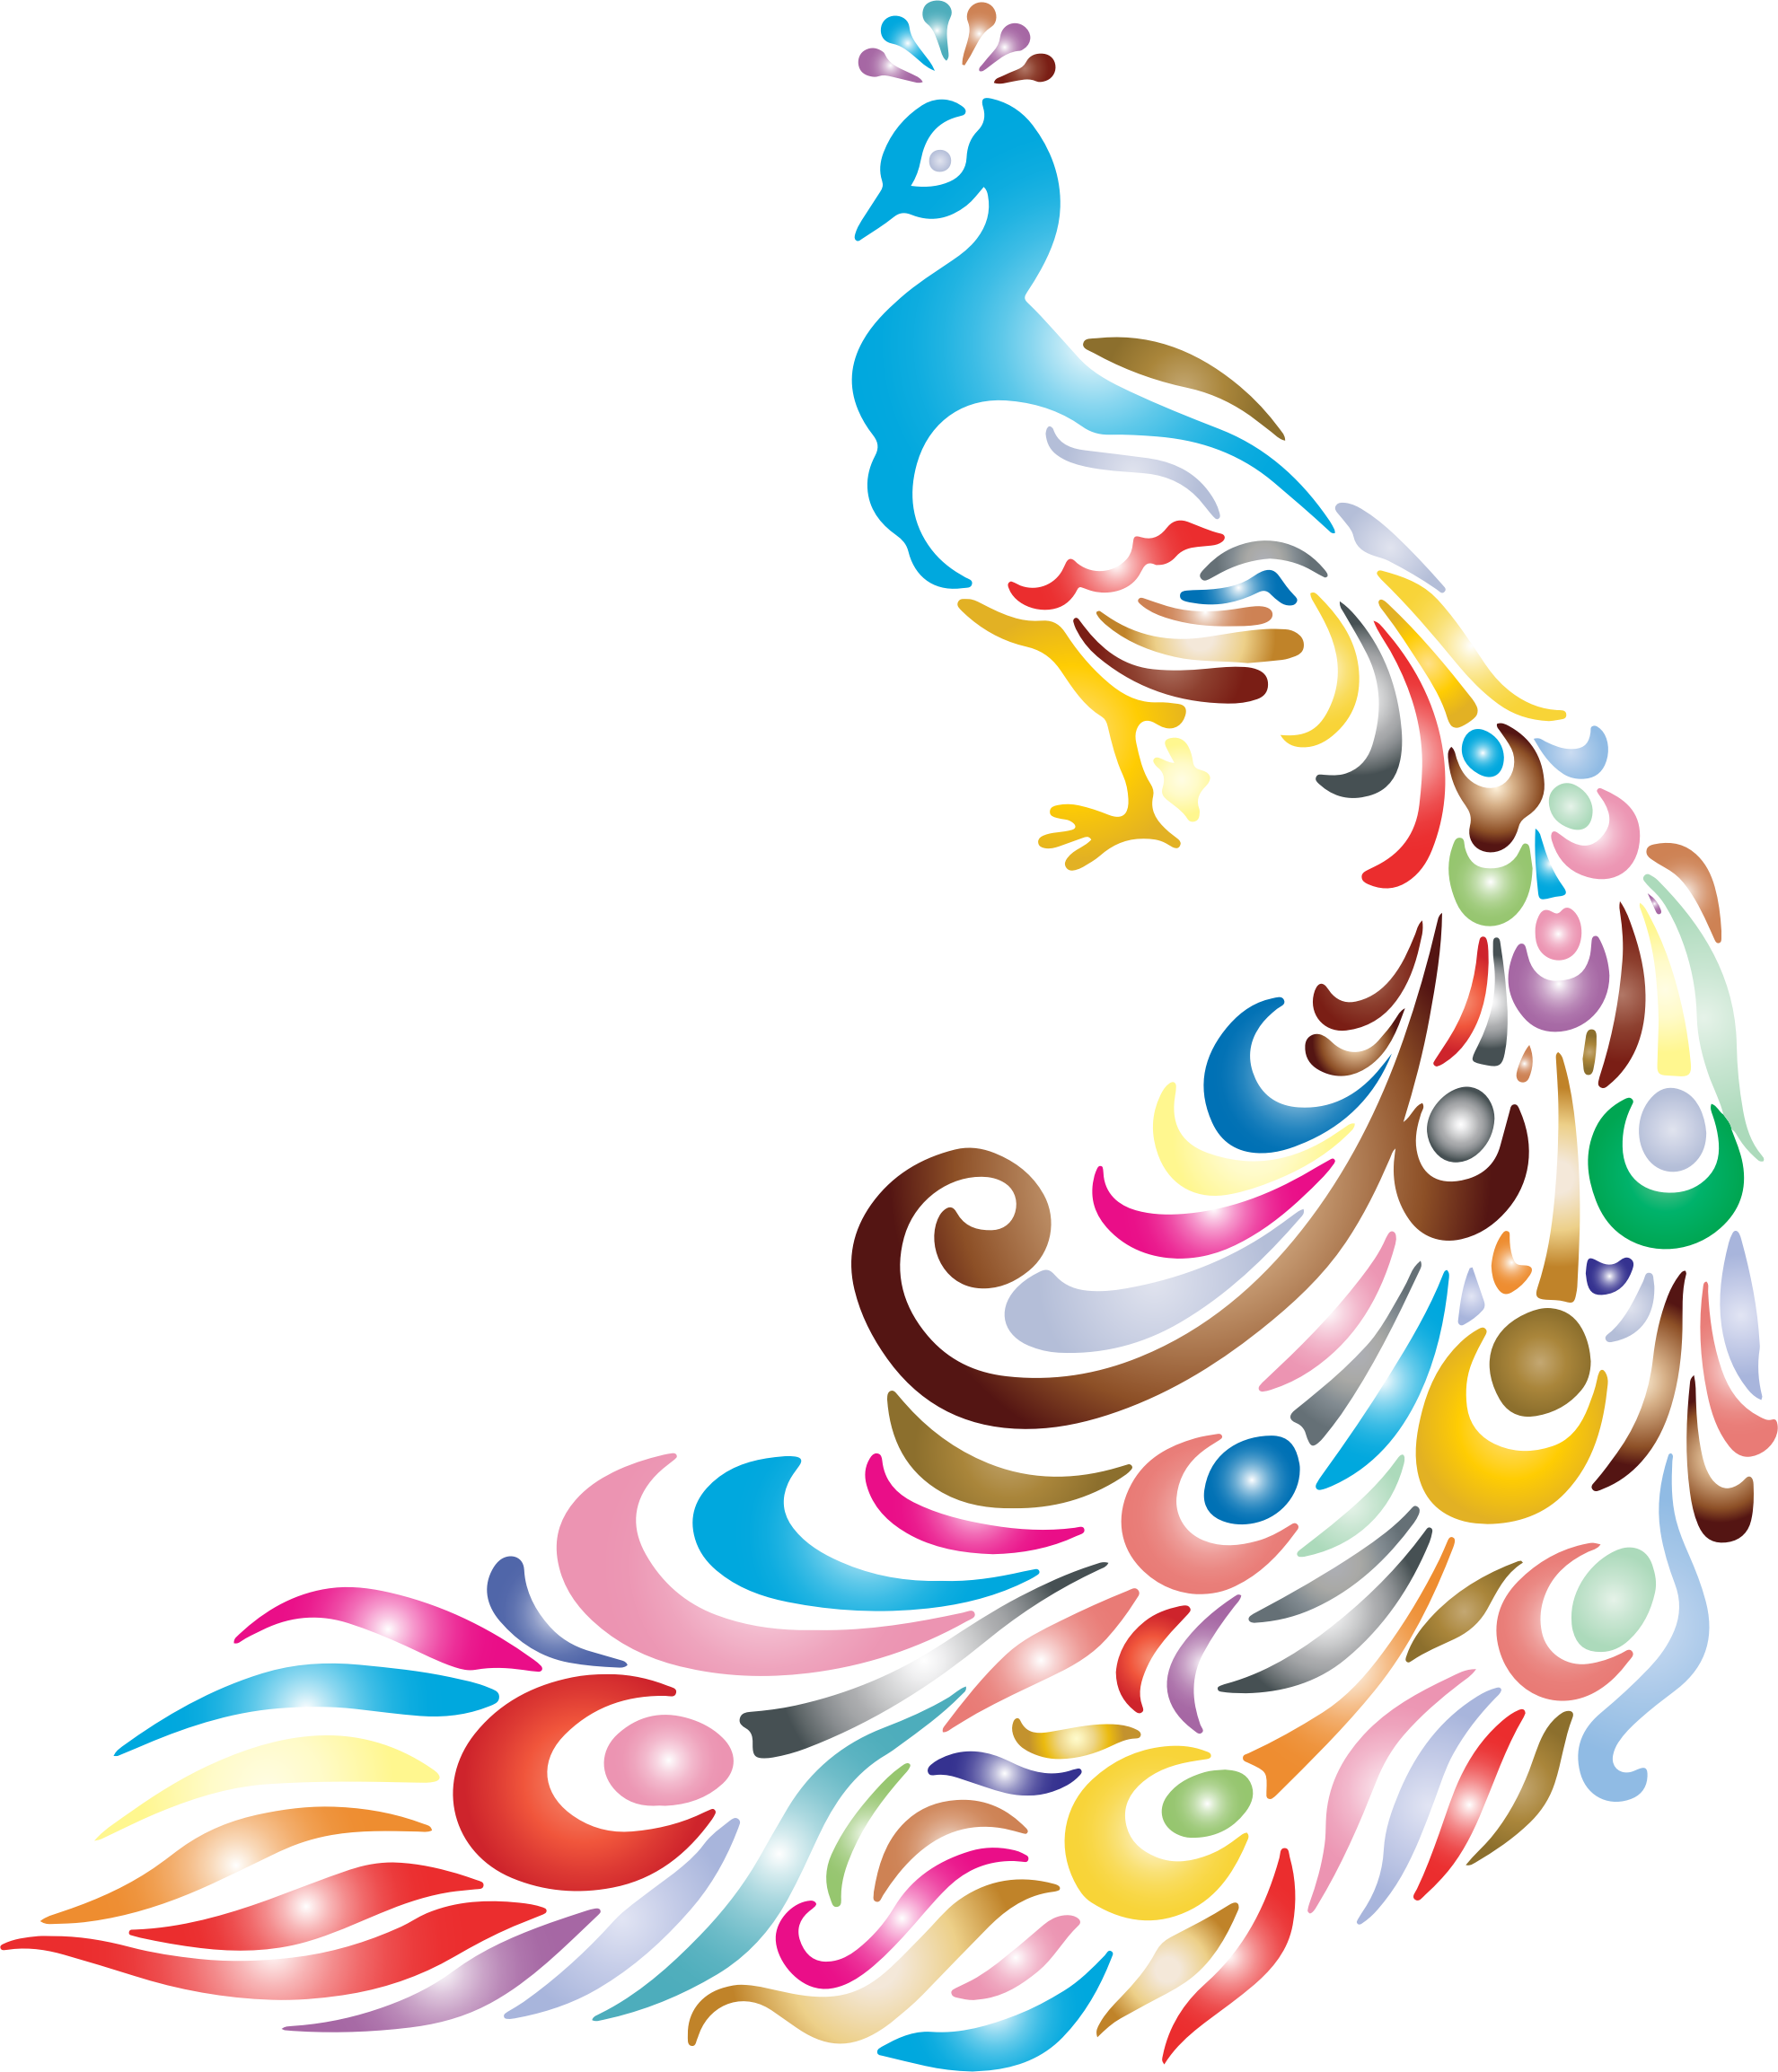 December clipart simple. Cartoon peacock vector clip